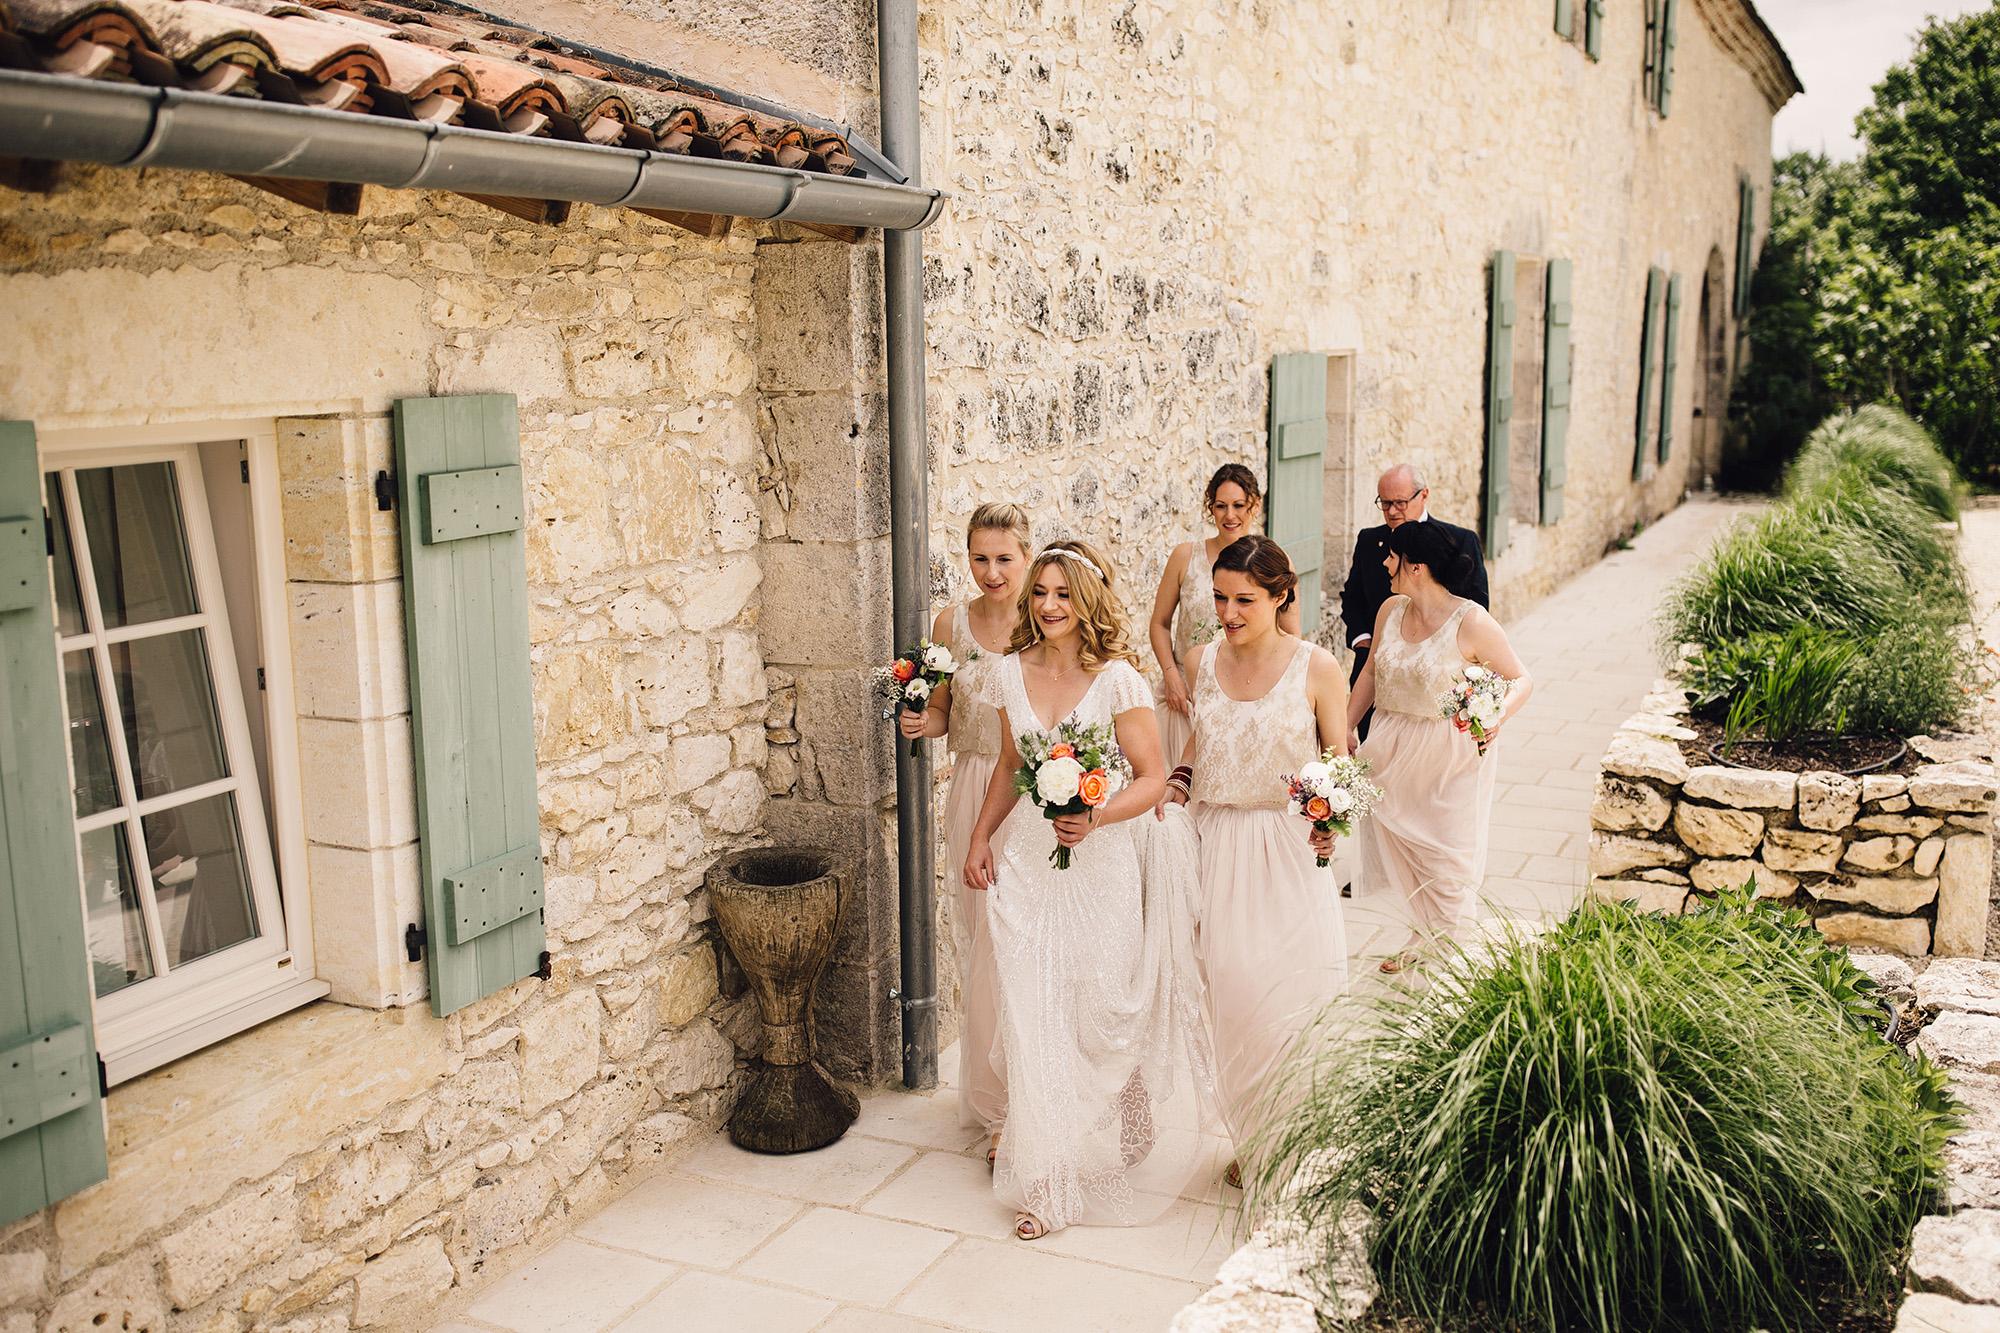 Hannah-Bespoke-Bridesmaids-Bohemian-French-Wedding-Gold-Lace-Susanna-Greening-Designs-Matlock-Derbyshire-2